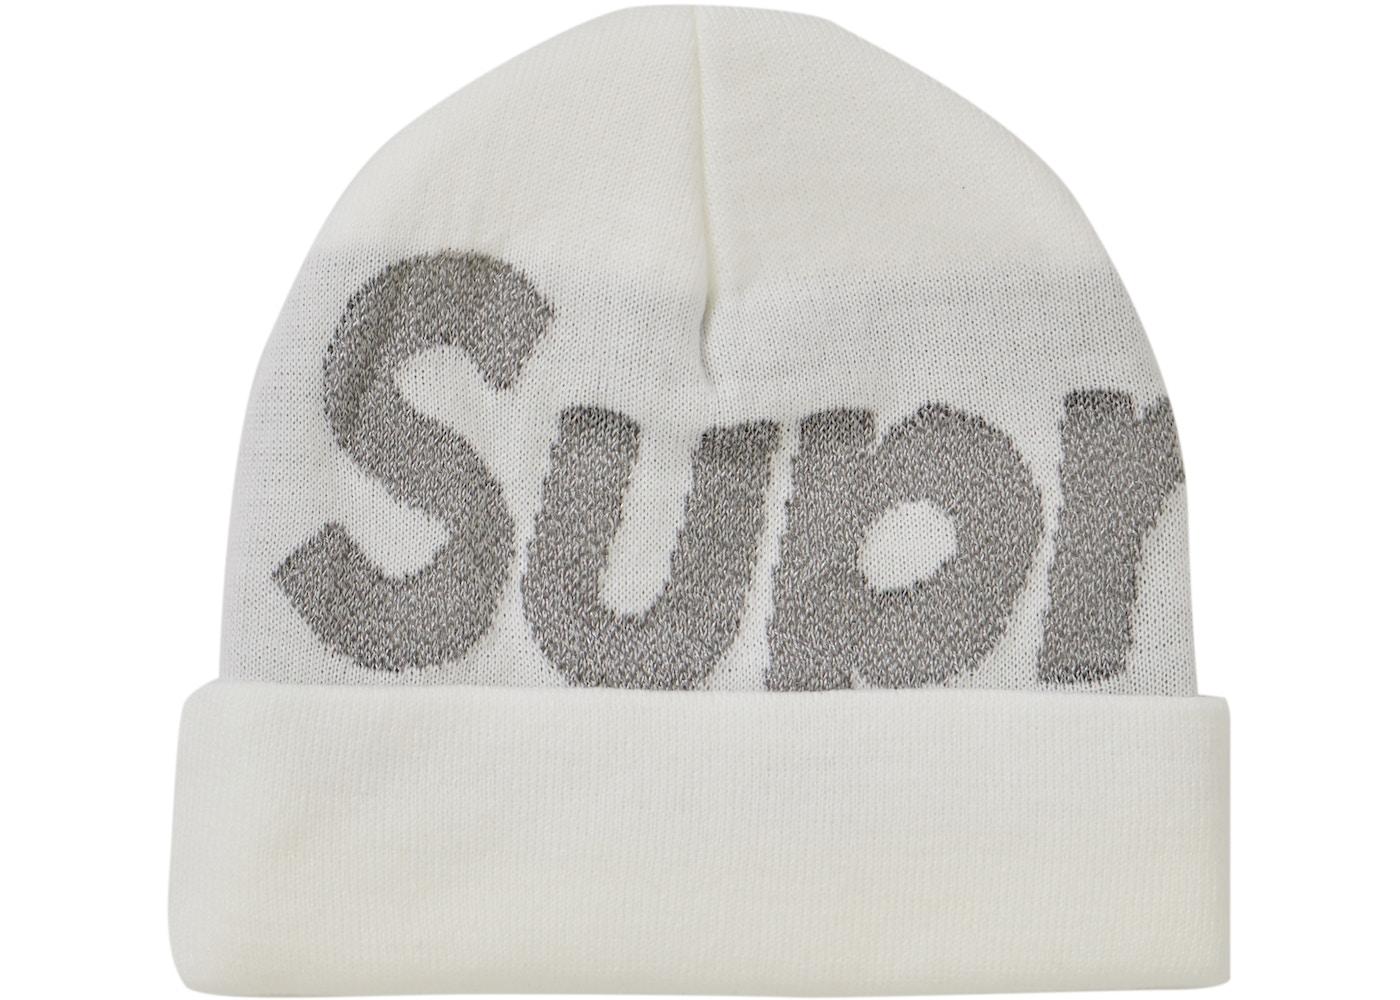 Streetwear - Supreme Headwear - New Highest Bids 5b0df66a93d9